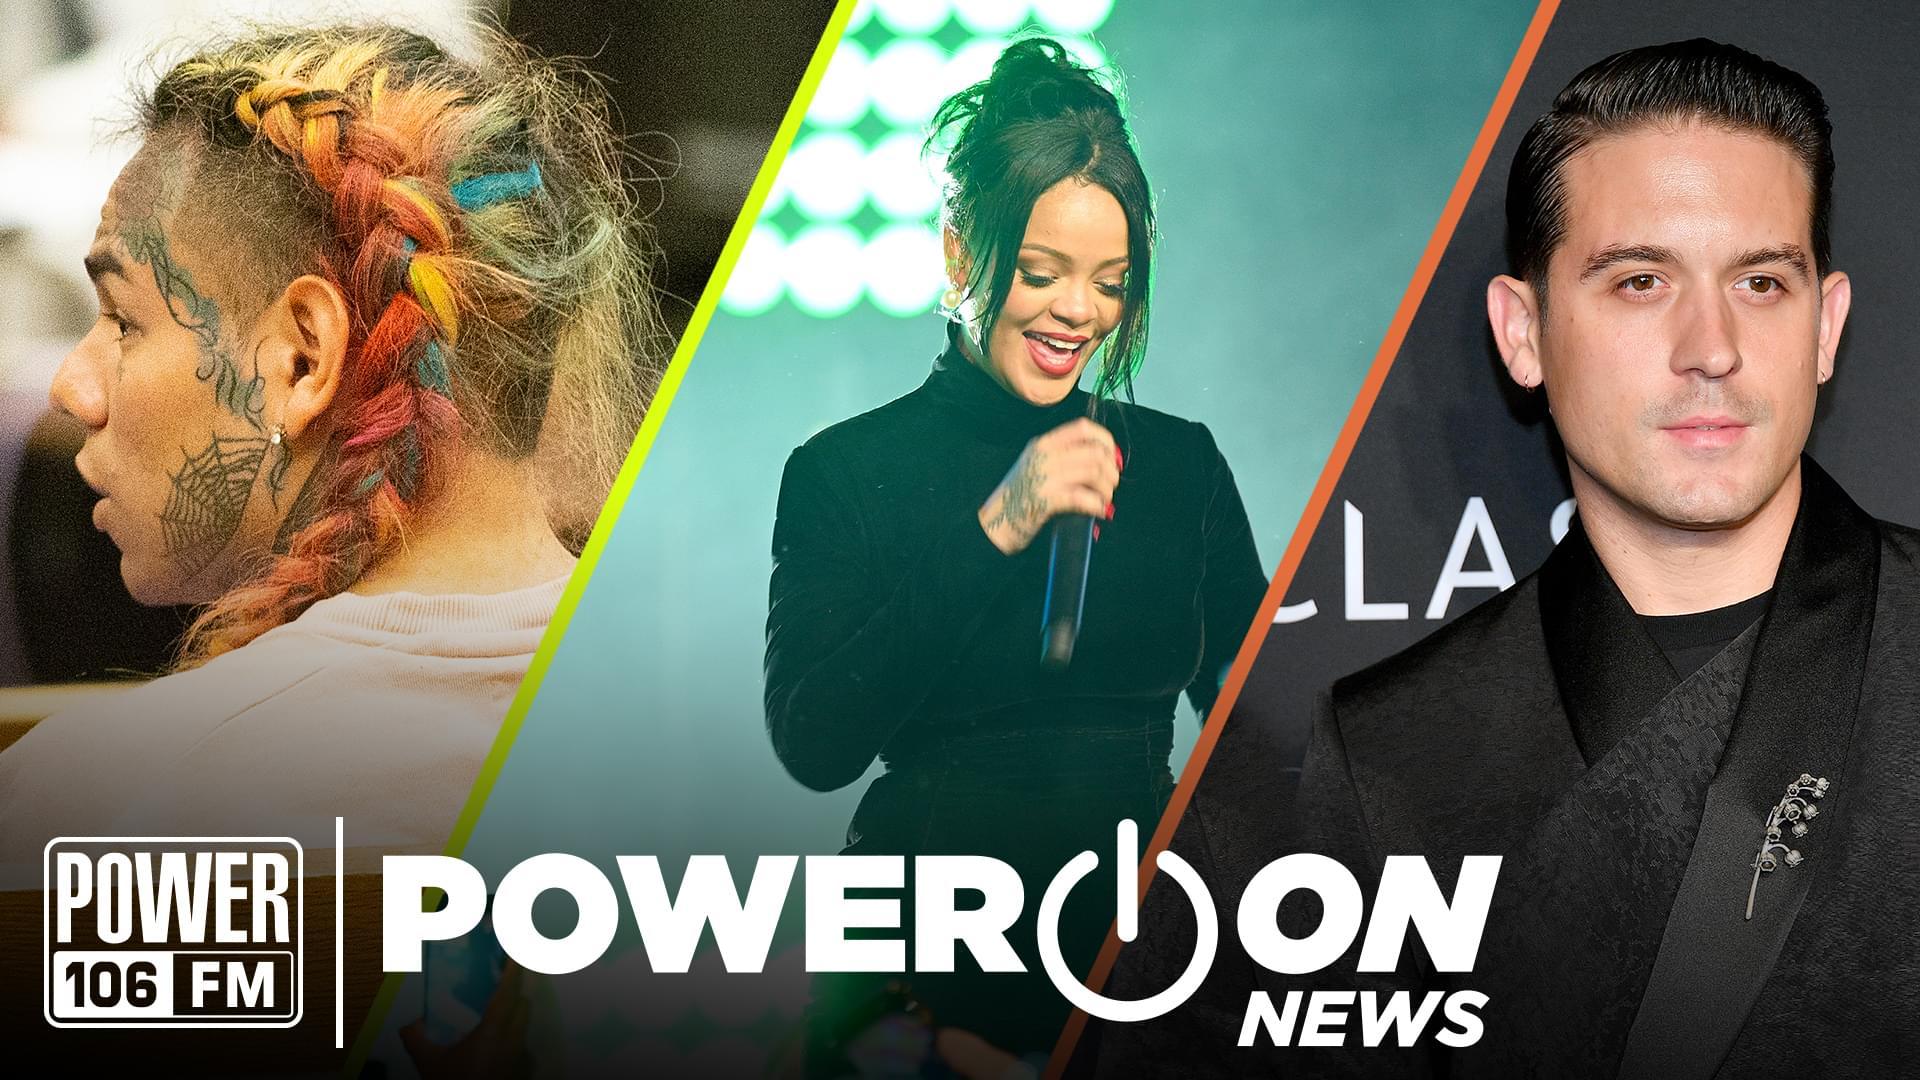 #PowerOn: G-Eazy Drops 'B-Sides', Riri Raises Eyebrows at Diamond Ball & Tekashi Snitches